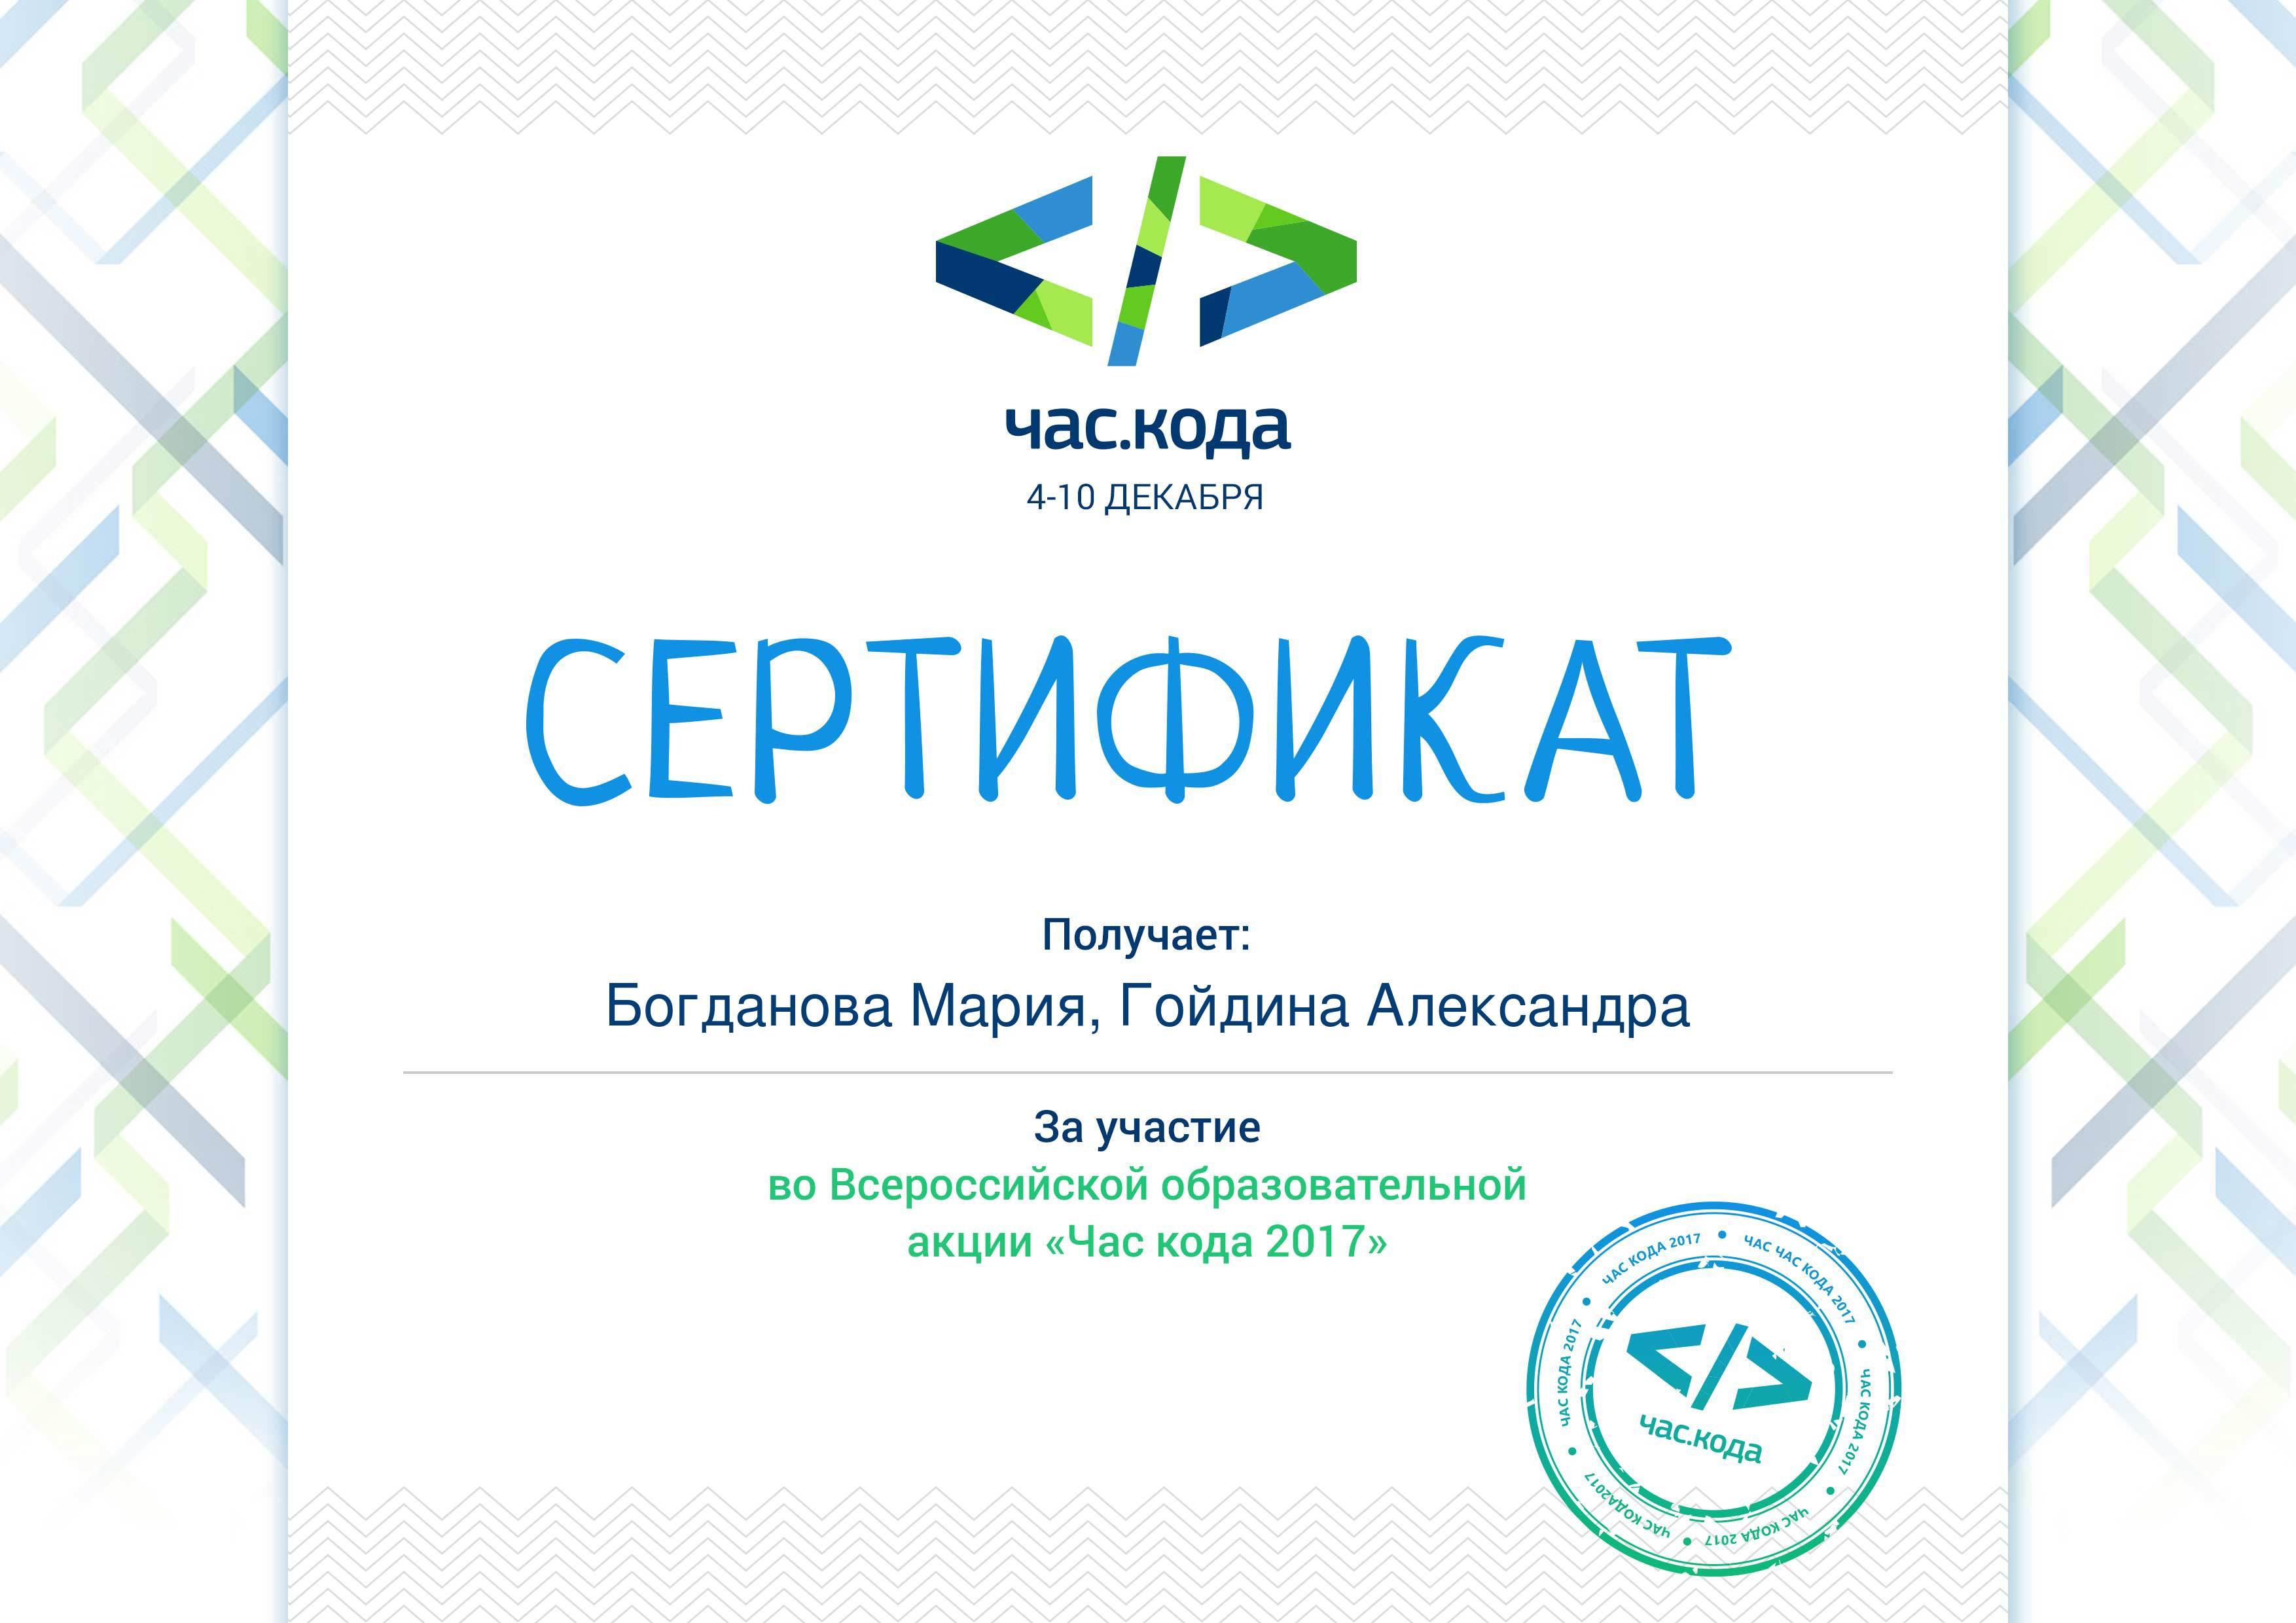 Boghdanova_Mariia,_Goidina_Alieksandra.jpg